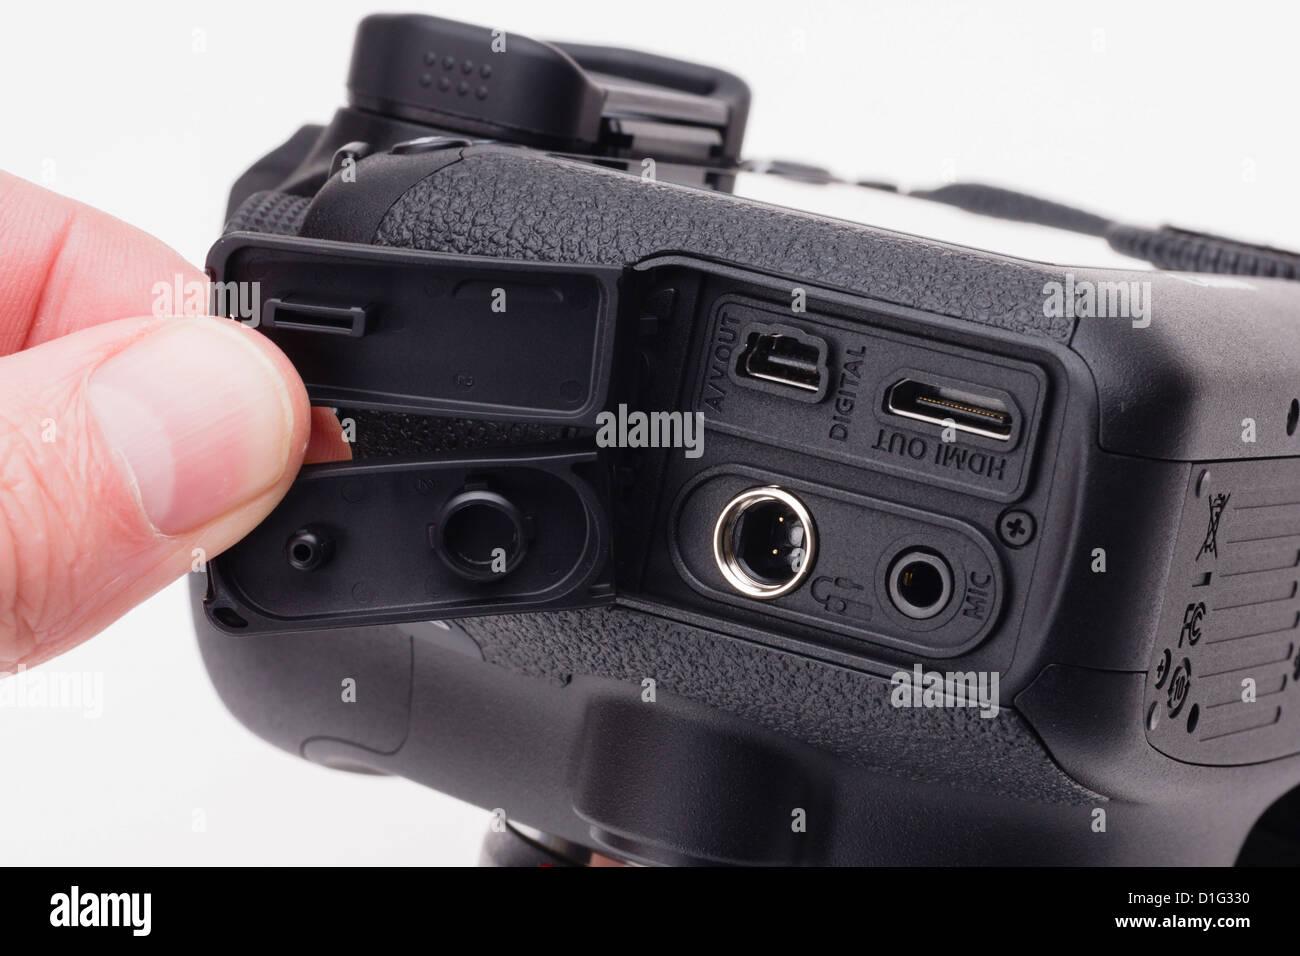 Canon EOS 6D full Frame DSLR, günstigen Preis. Schnittstellen für ...